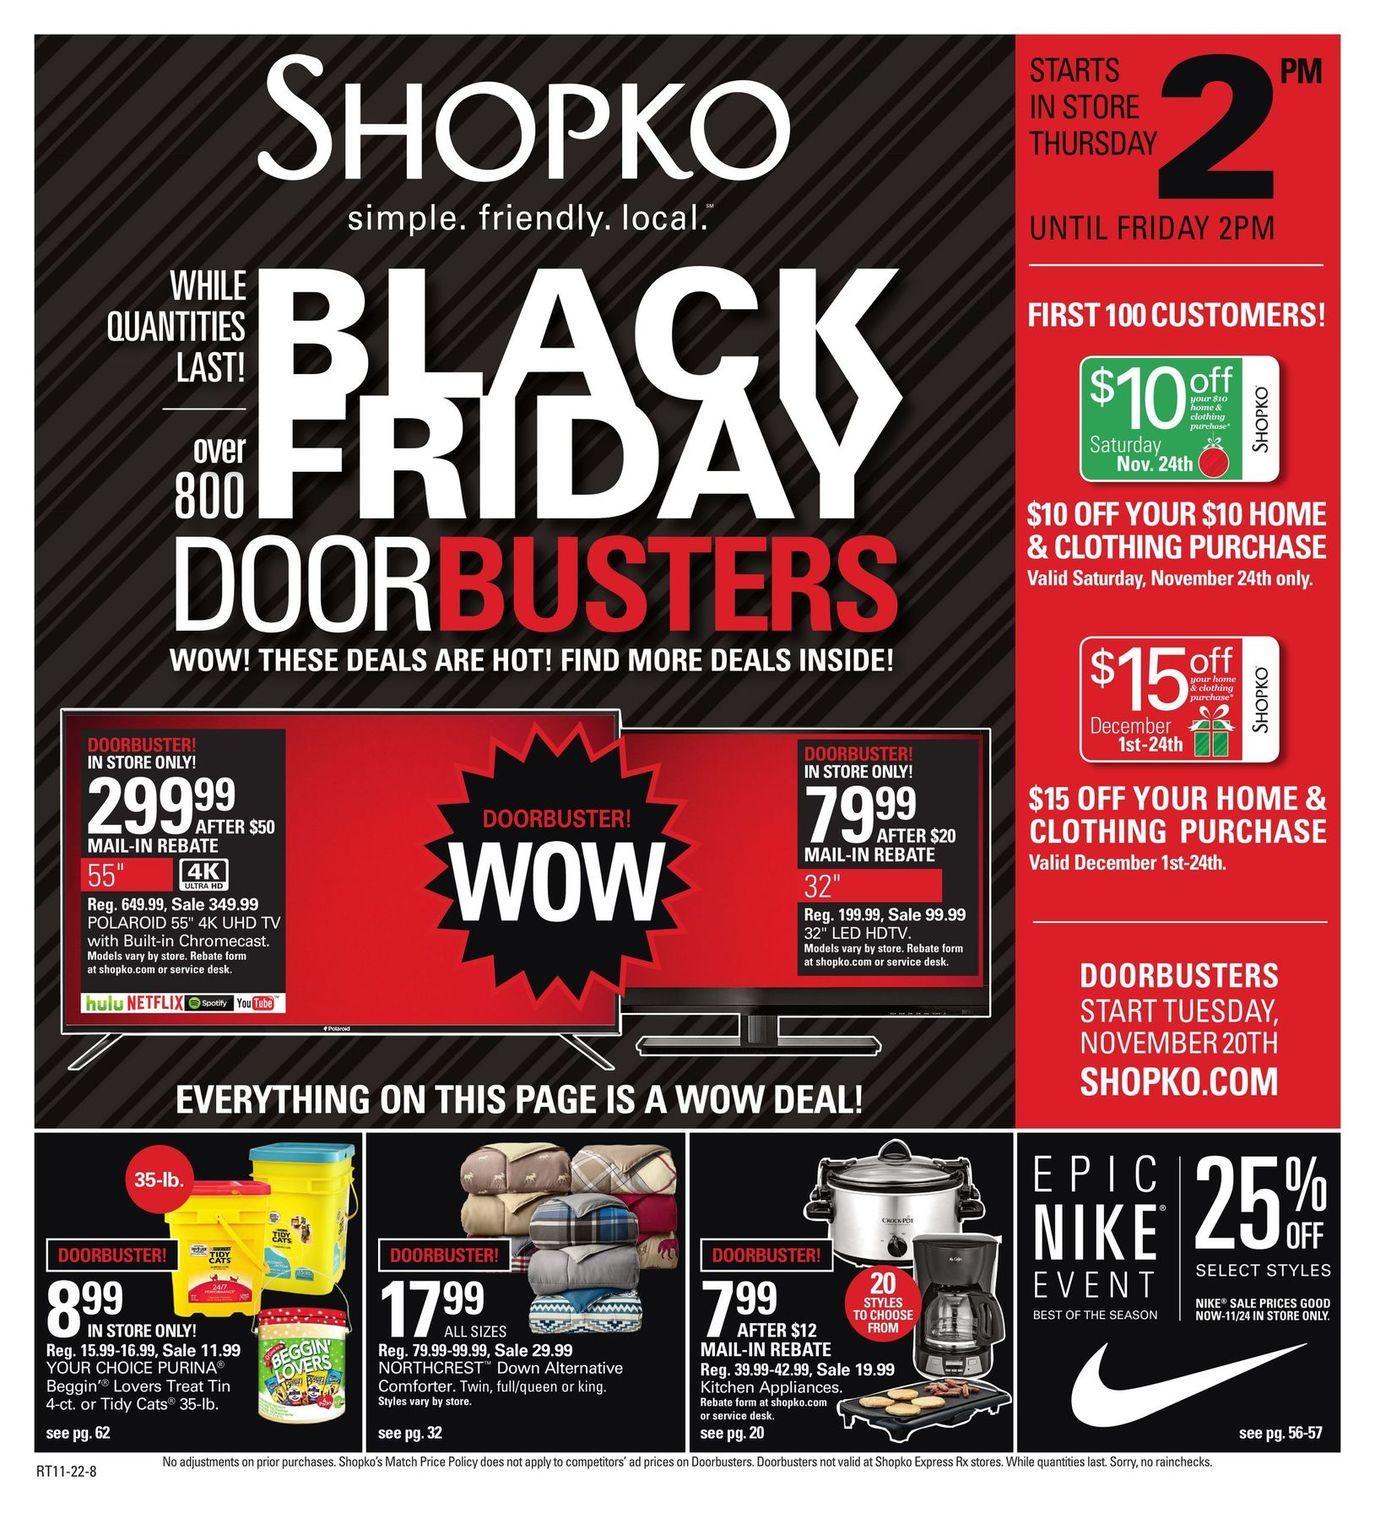 Shopko 2018 Black Friday Ad in 2020 Black friday ads